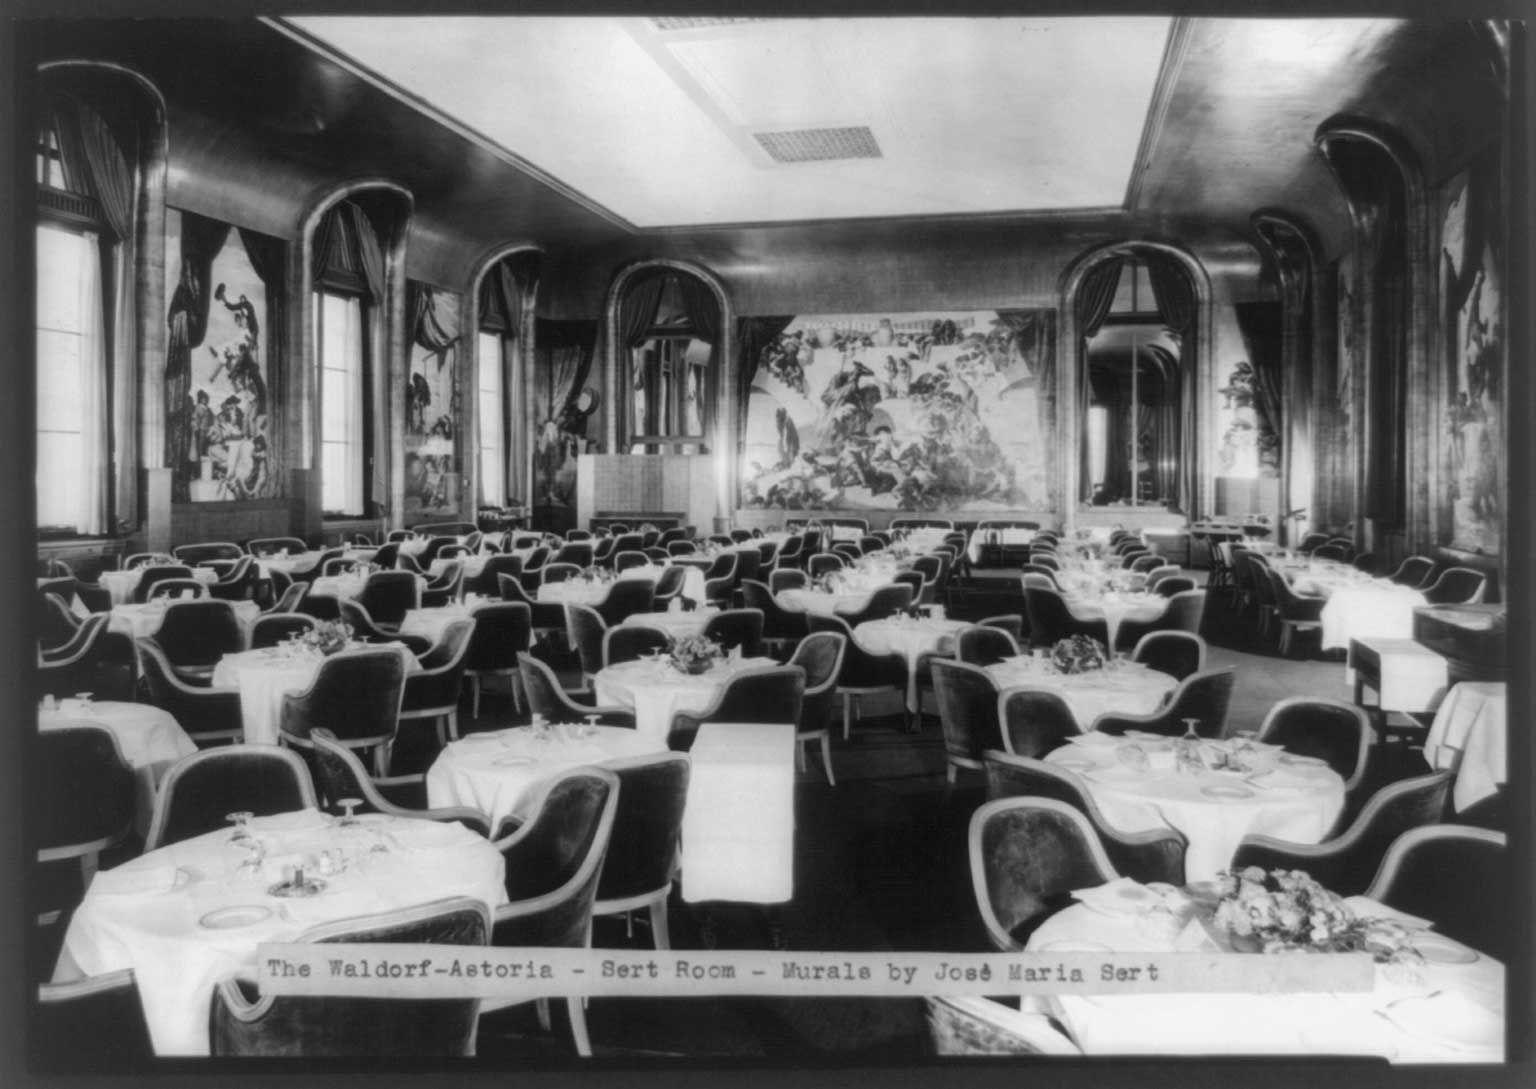 The Waldorf Astoria S Prestigious 85 Year Run Captured In Historic Photos Waldorf Astoria Nyc Hotels Historical Photos